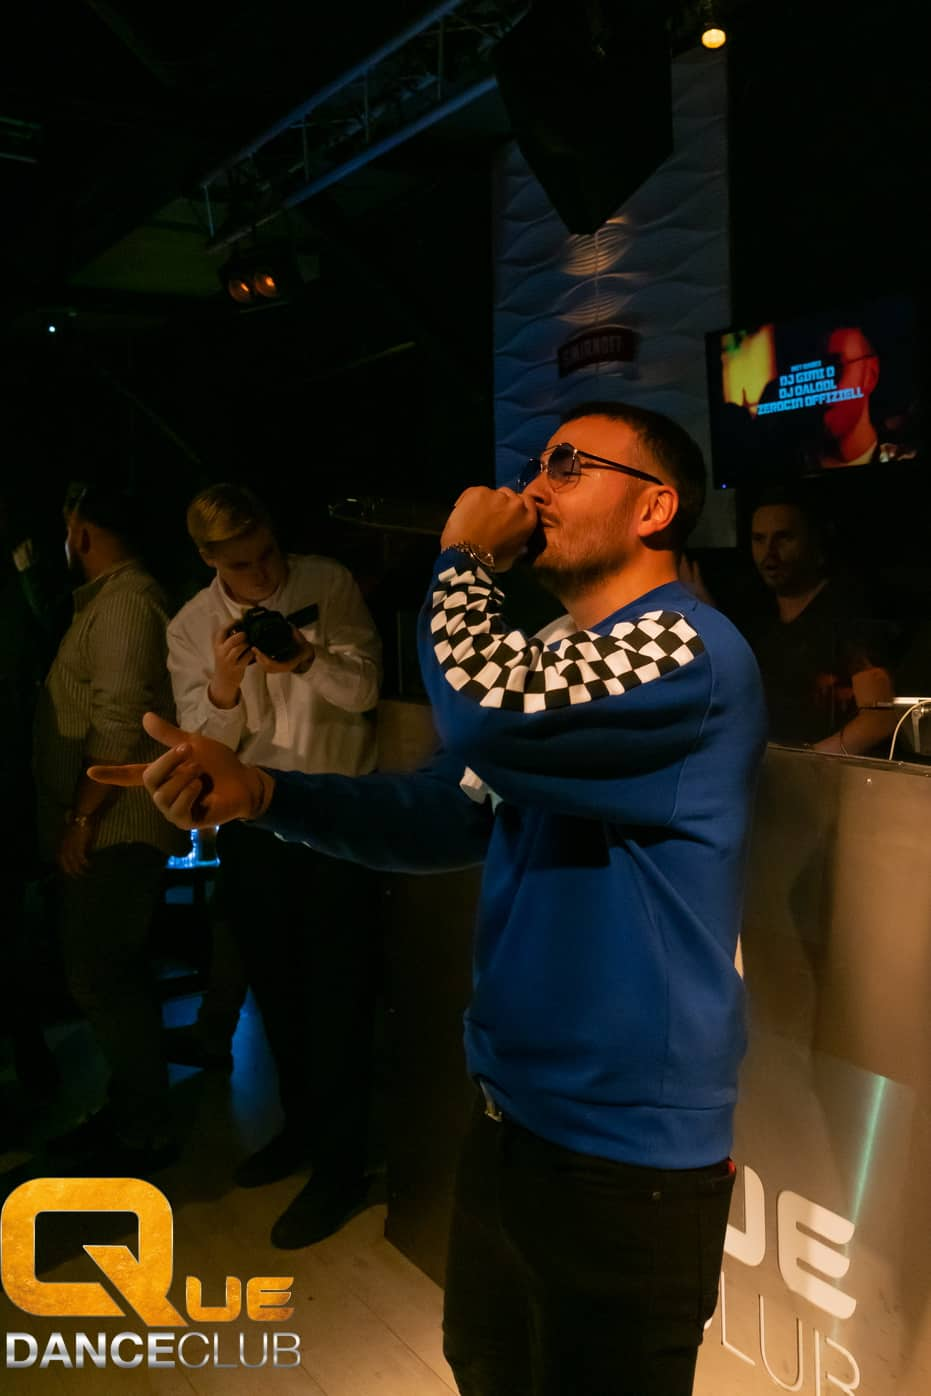 2018_12_08_Que_Danceclub_Paparazzo_Night_Ardian_Bujupi_Live_Nightlife_Scene_Timo_061